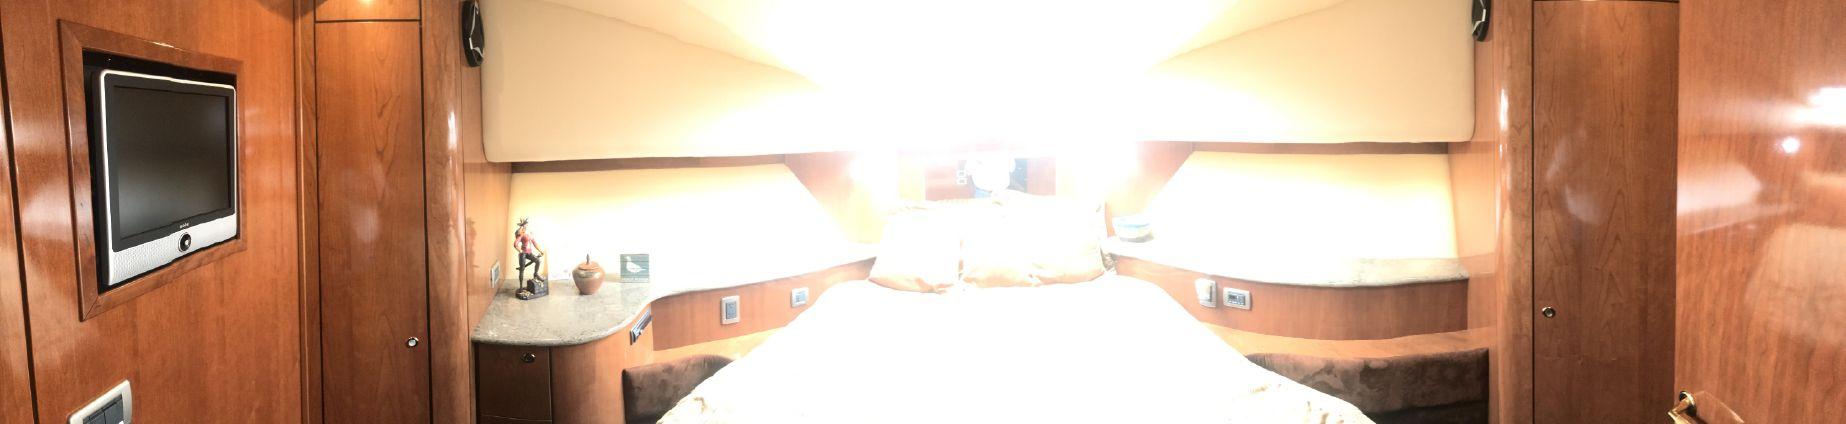 Meridian 580 Pilothouse image